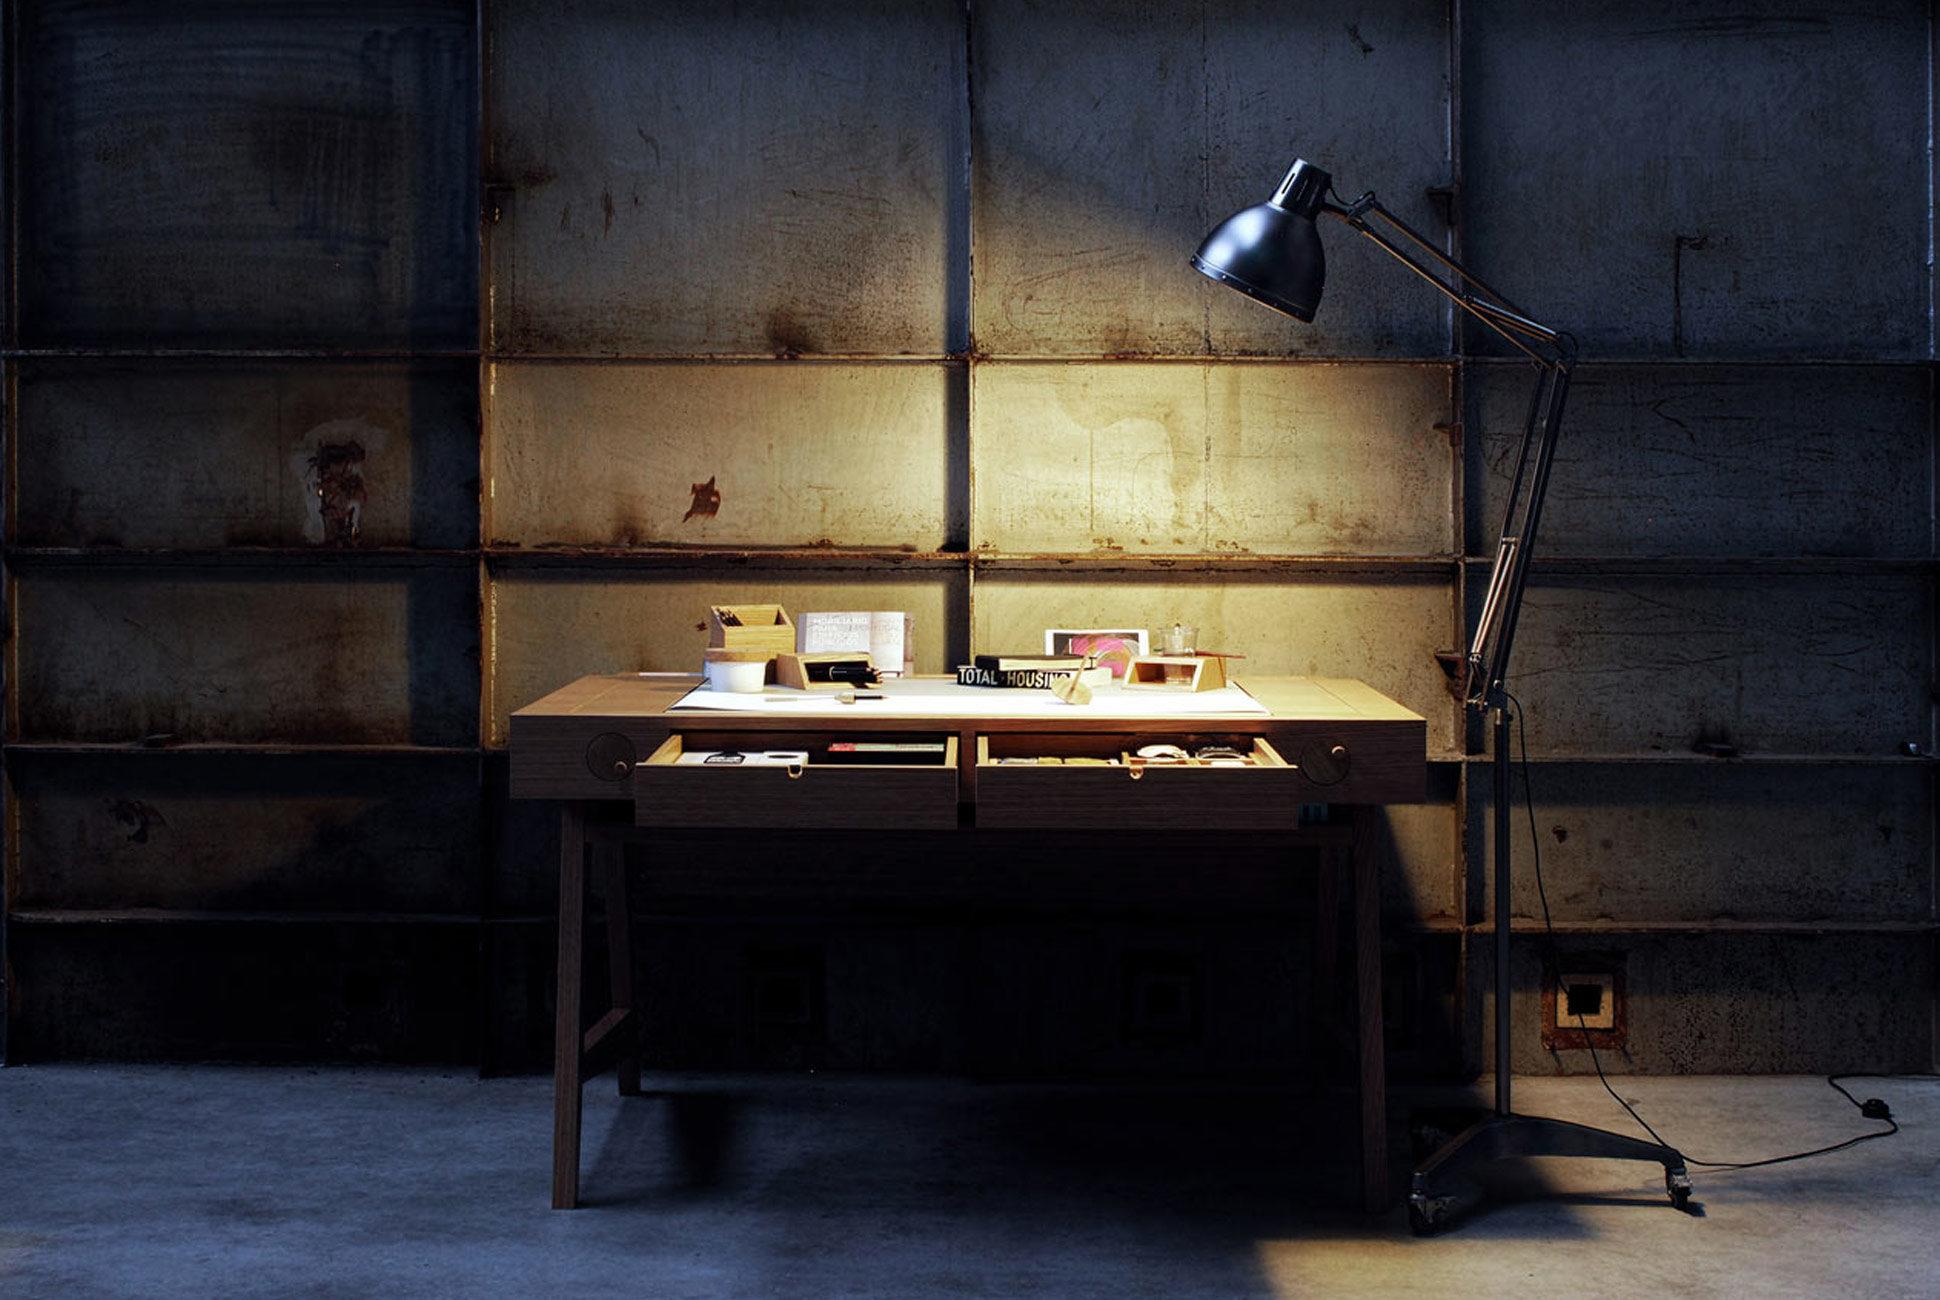 Digitalab-for-Viarco-Risko-Drawing-Desk-gear-patrol-slide-4-1940x1300.jpg